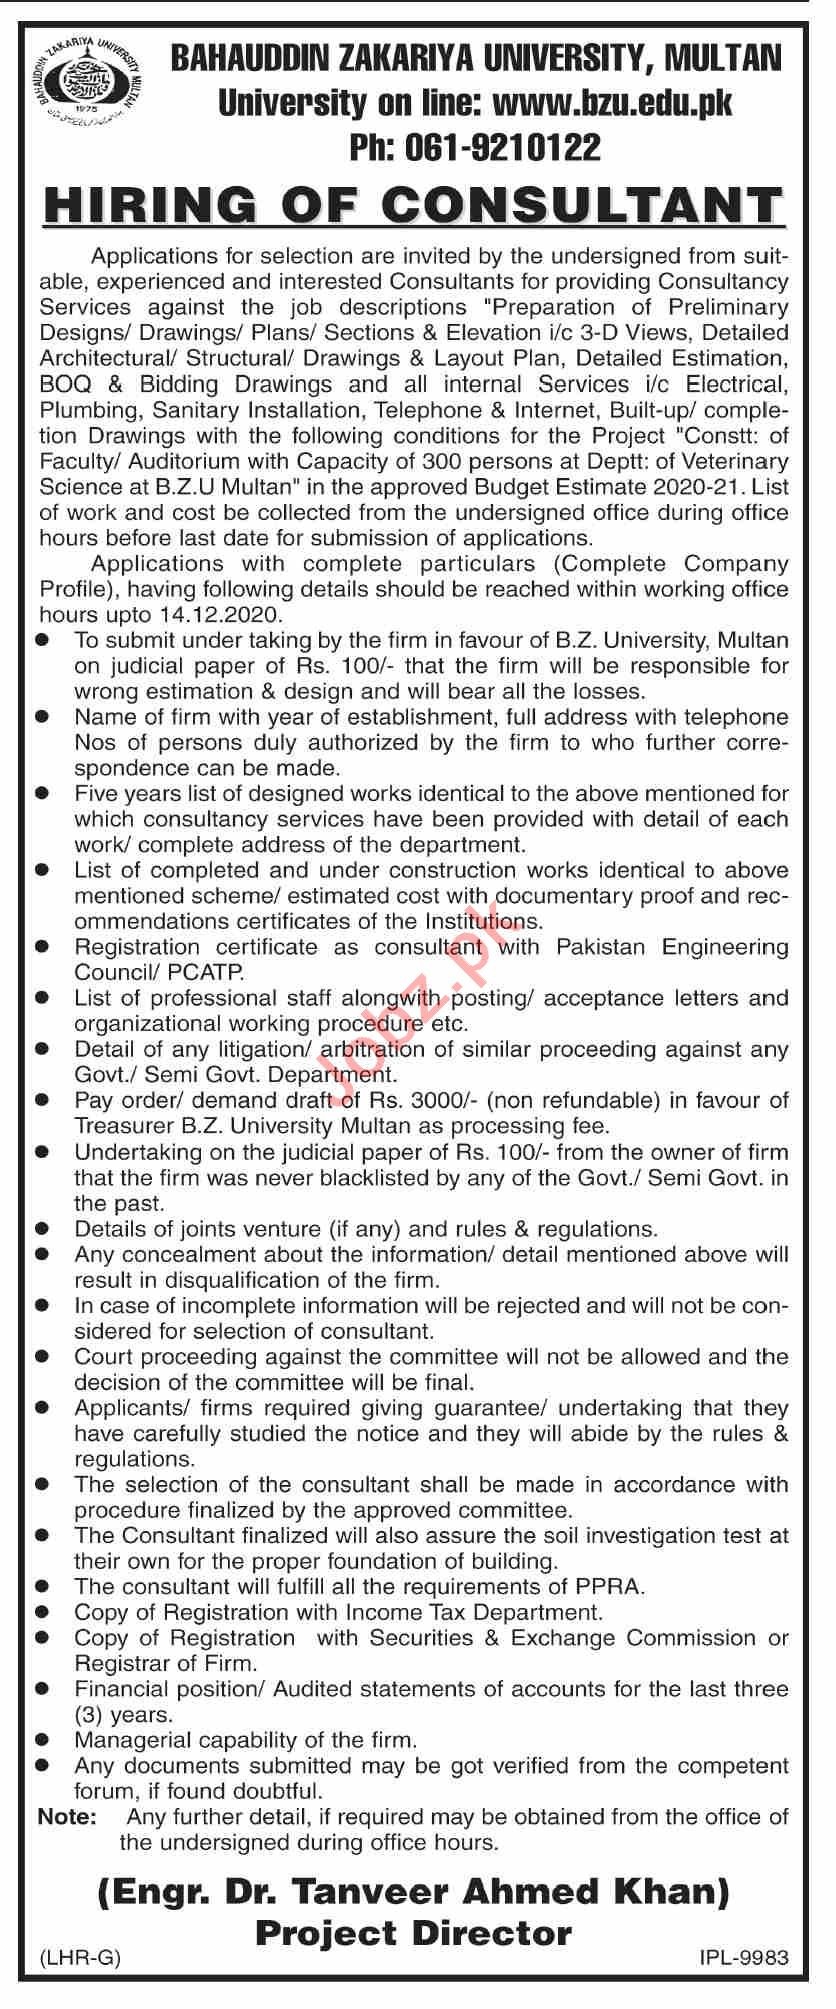 Bahauddin Zakariya University BZU Multan Jobs for Consultant